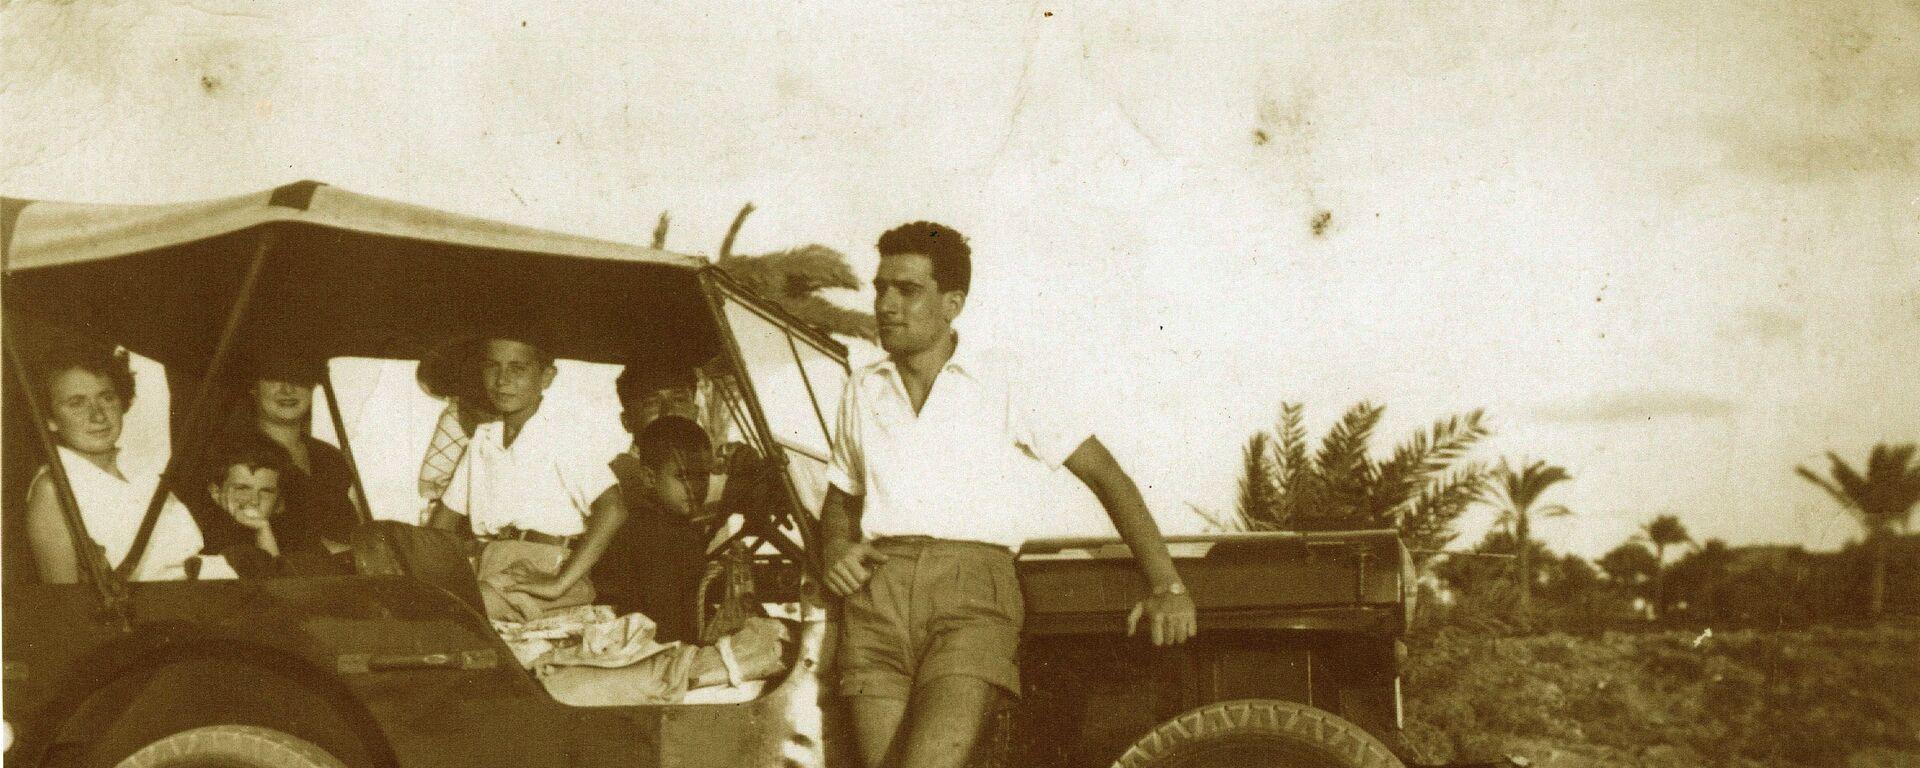 Eli Cohen en el canal de Suez - Sputnik Mundo, 1920, 18.05.2018